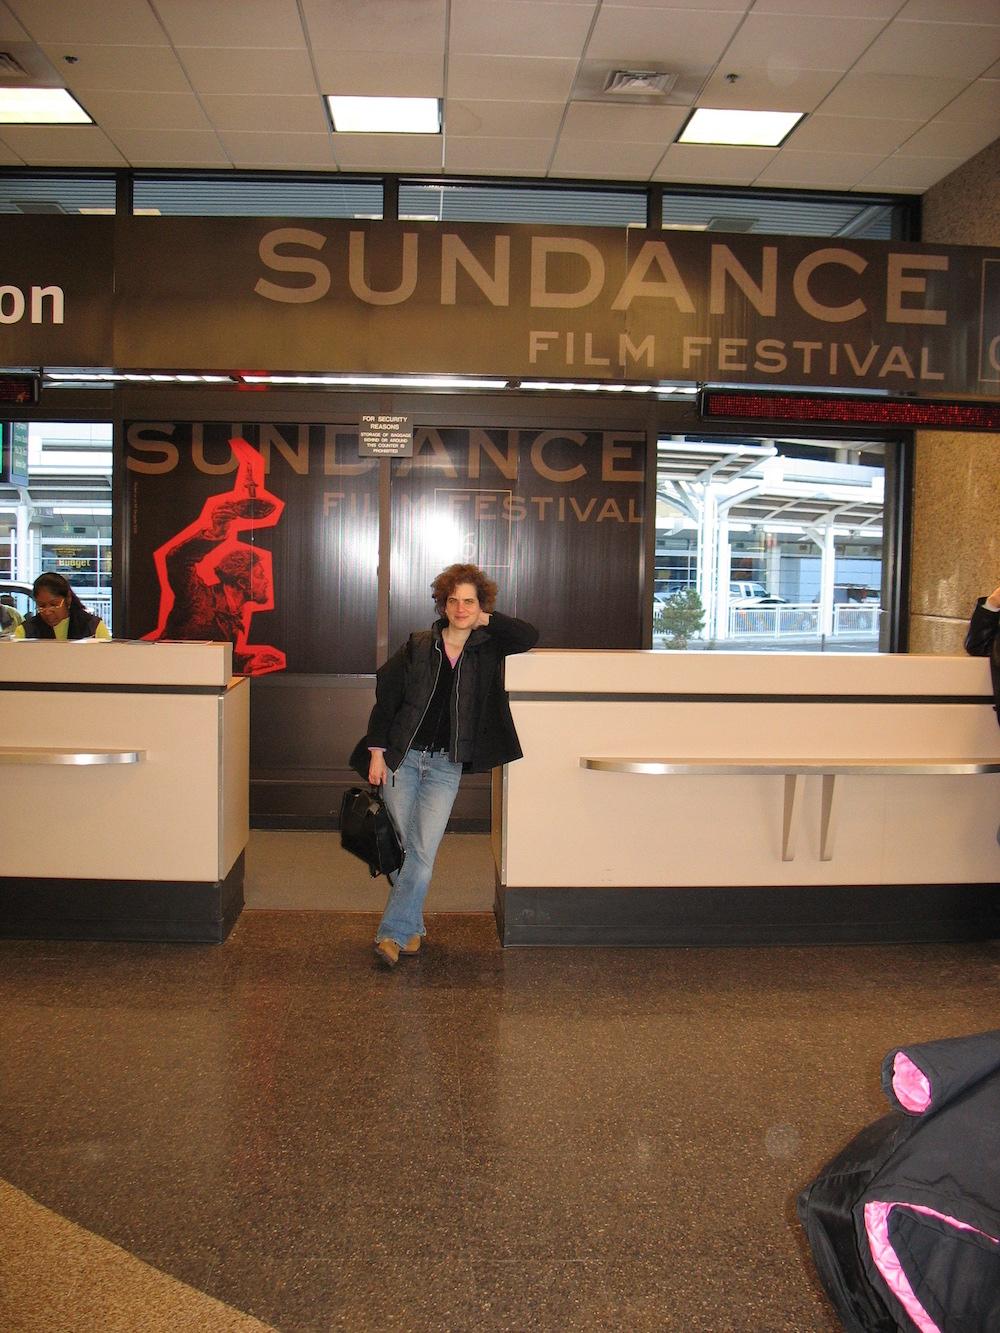 Salt Lake City Airport - awaiting the Sundance Shuttle